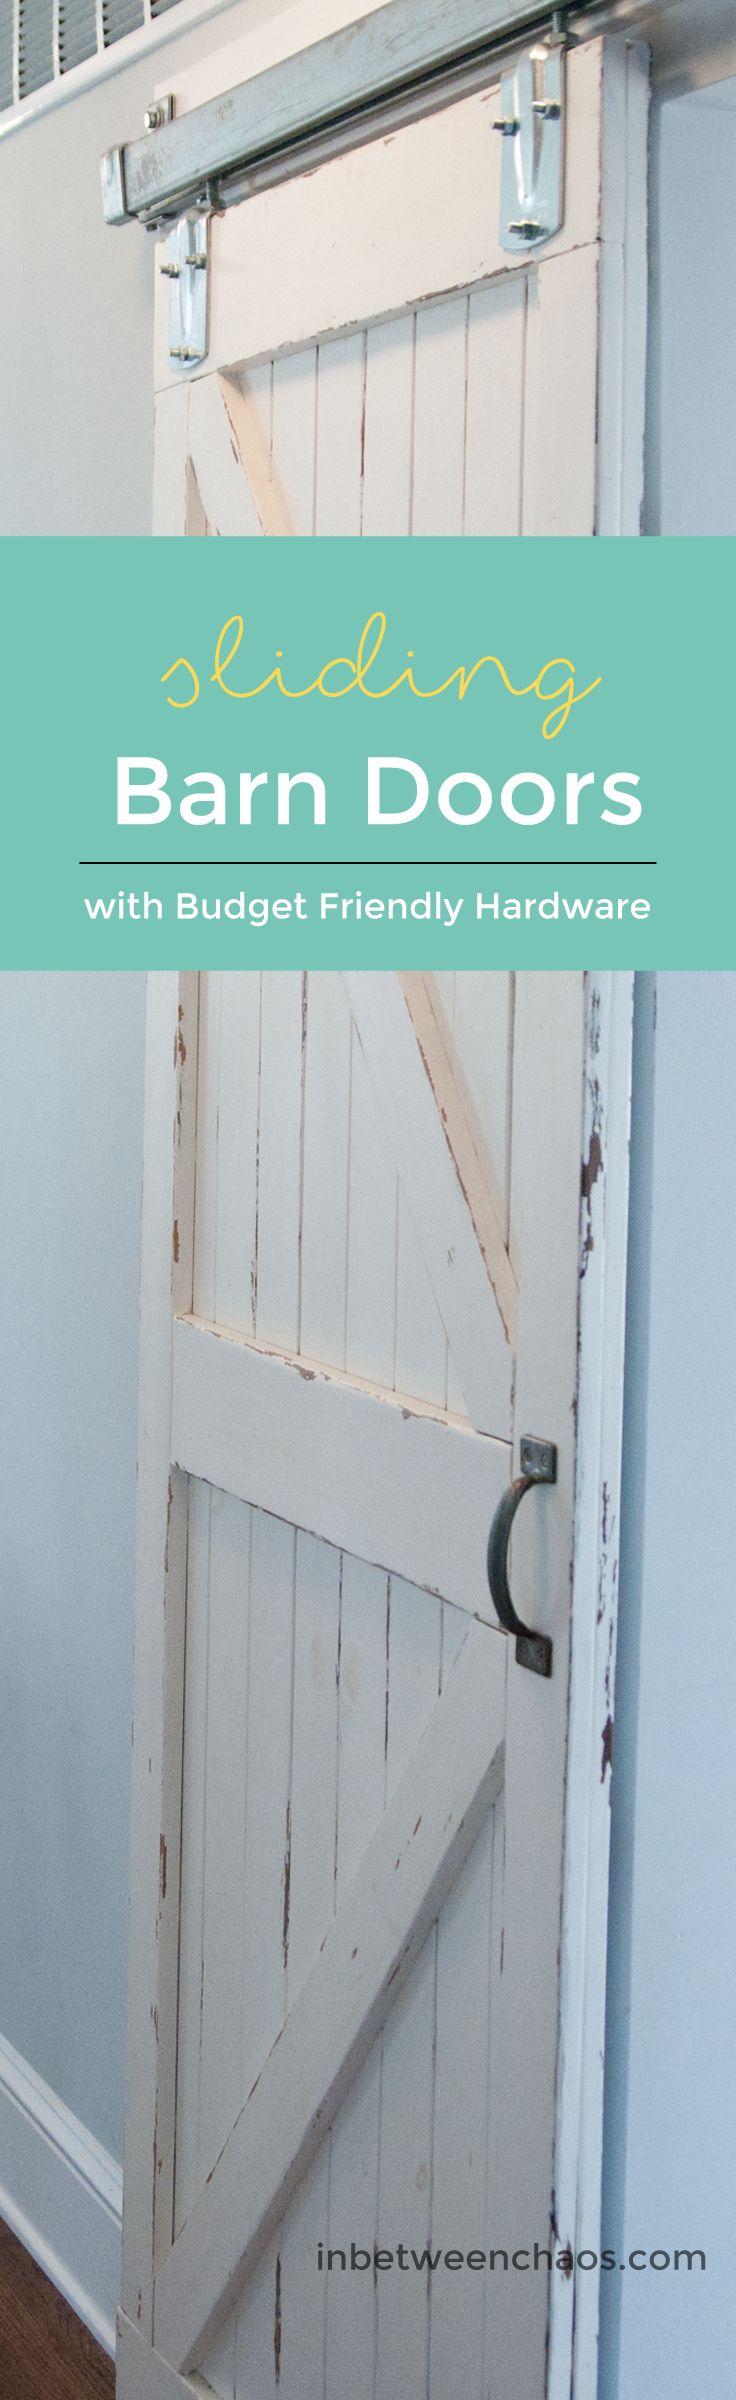 Sliding barn door hardware diy - Best 25 Diy Barn Door Hardware Ideas On Pinterest Sliding Barn Door Hardware Diy Sliding Door And Barn Door Hardware